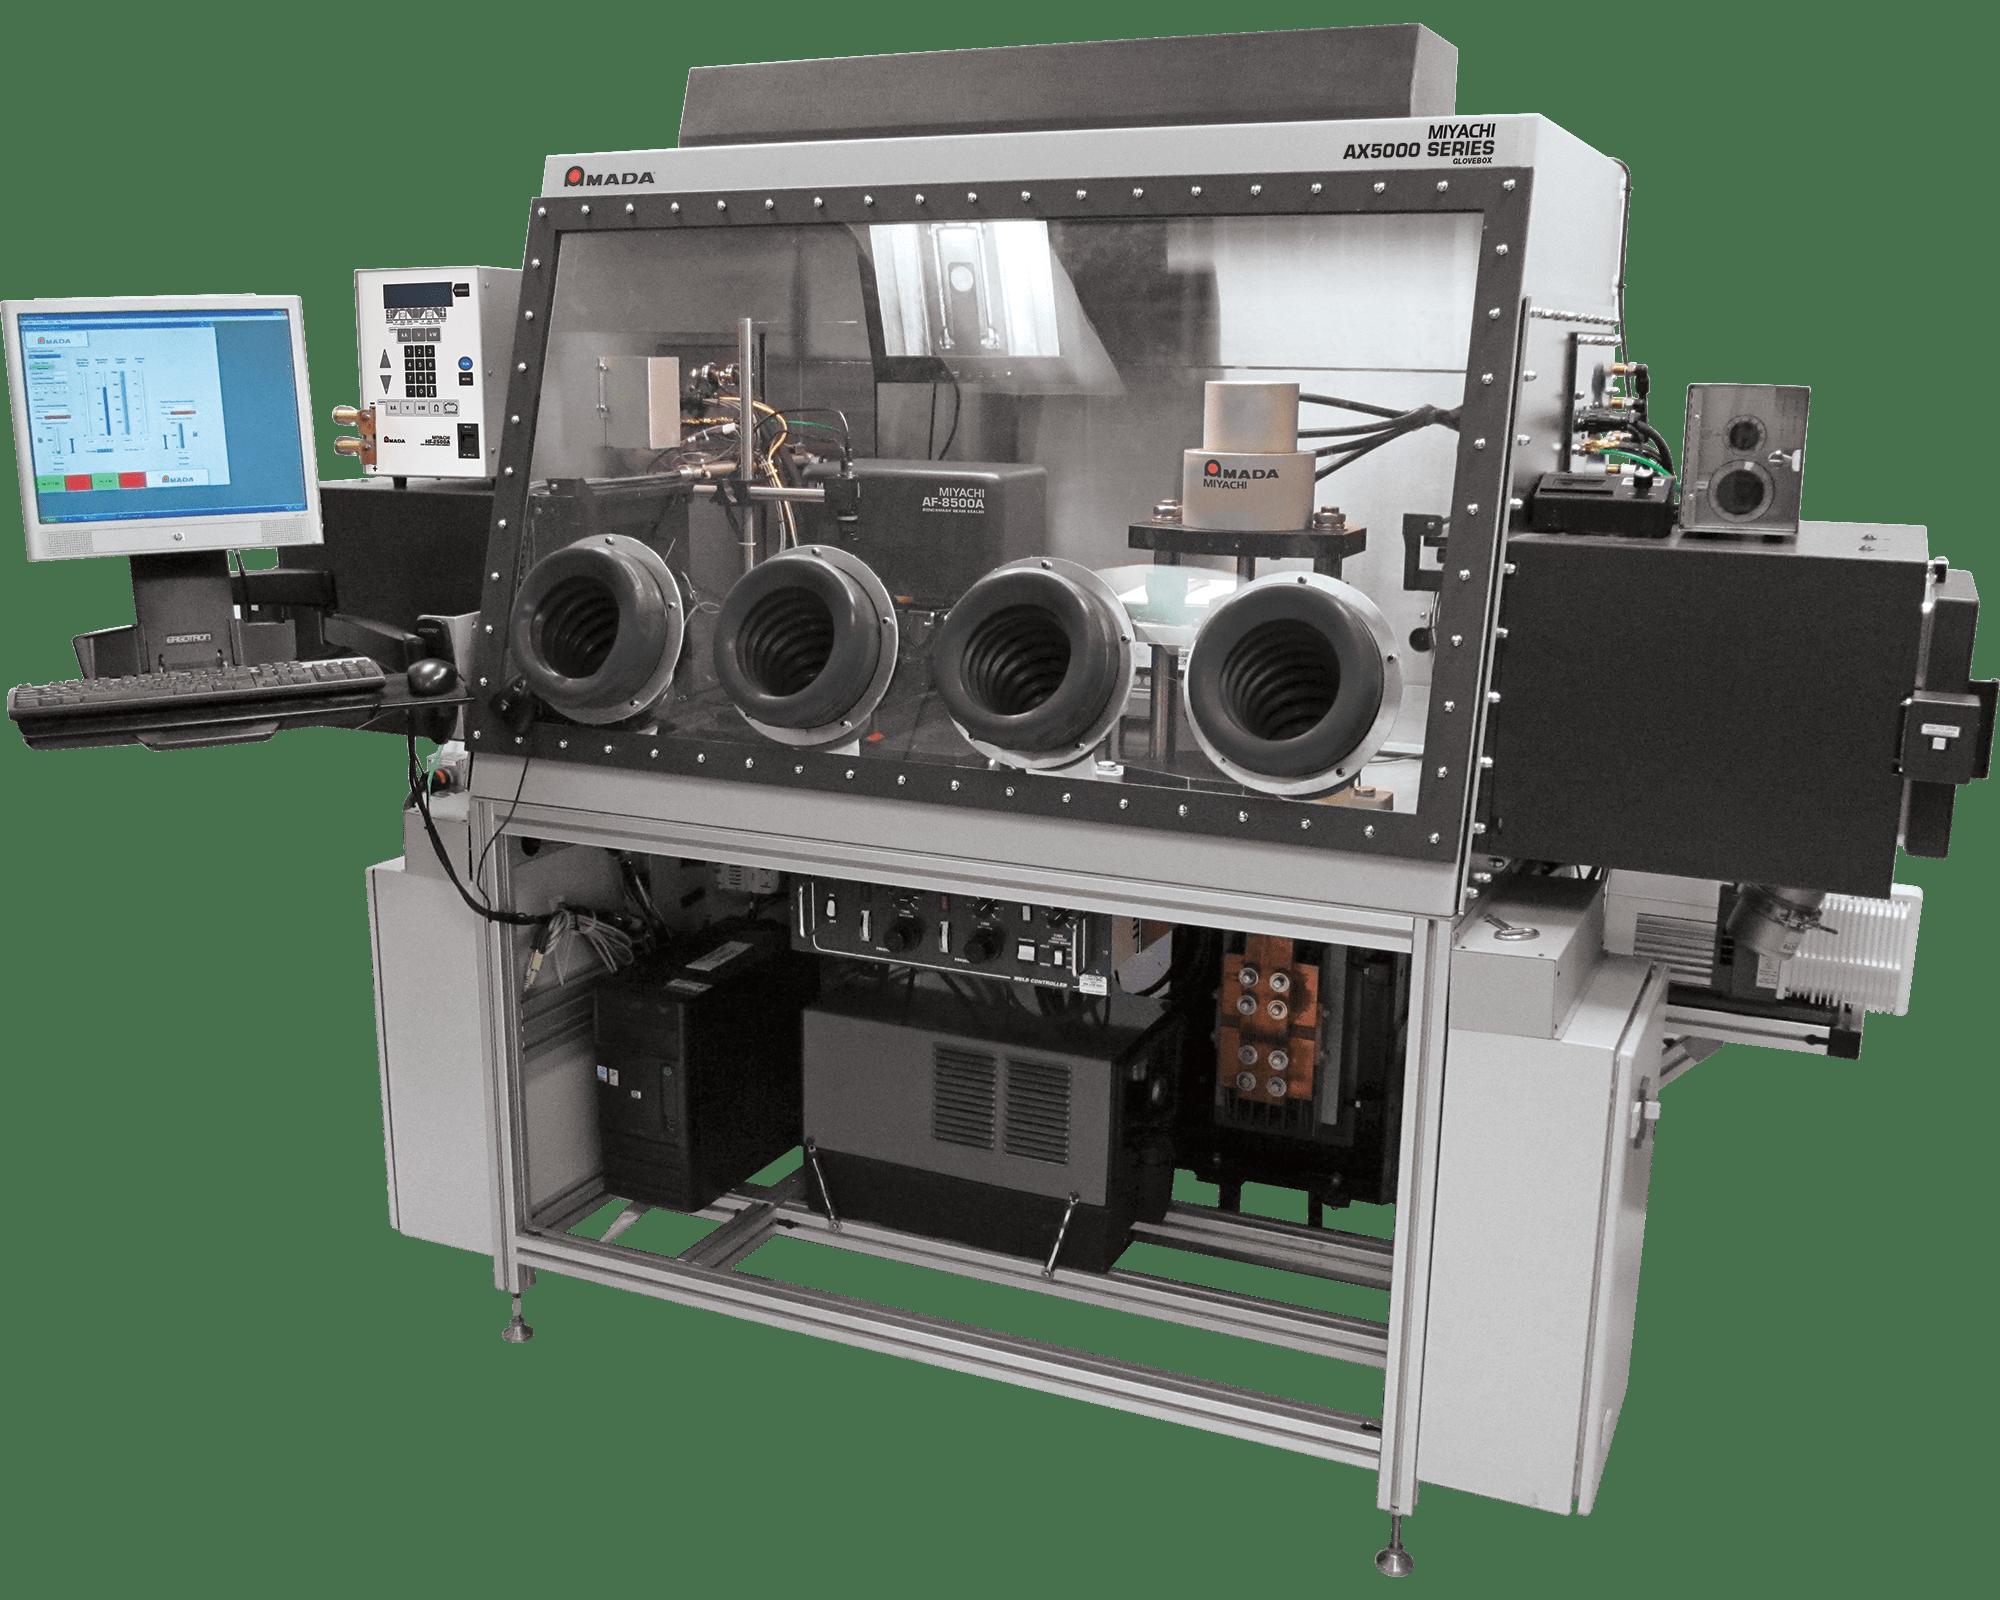 AX5000 Advanced Glovebox Welding System